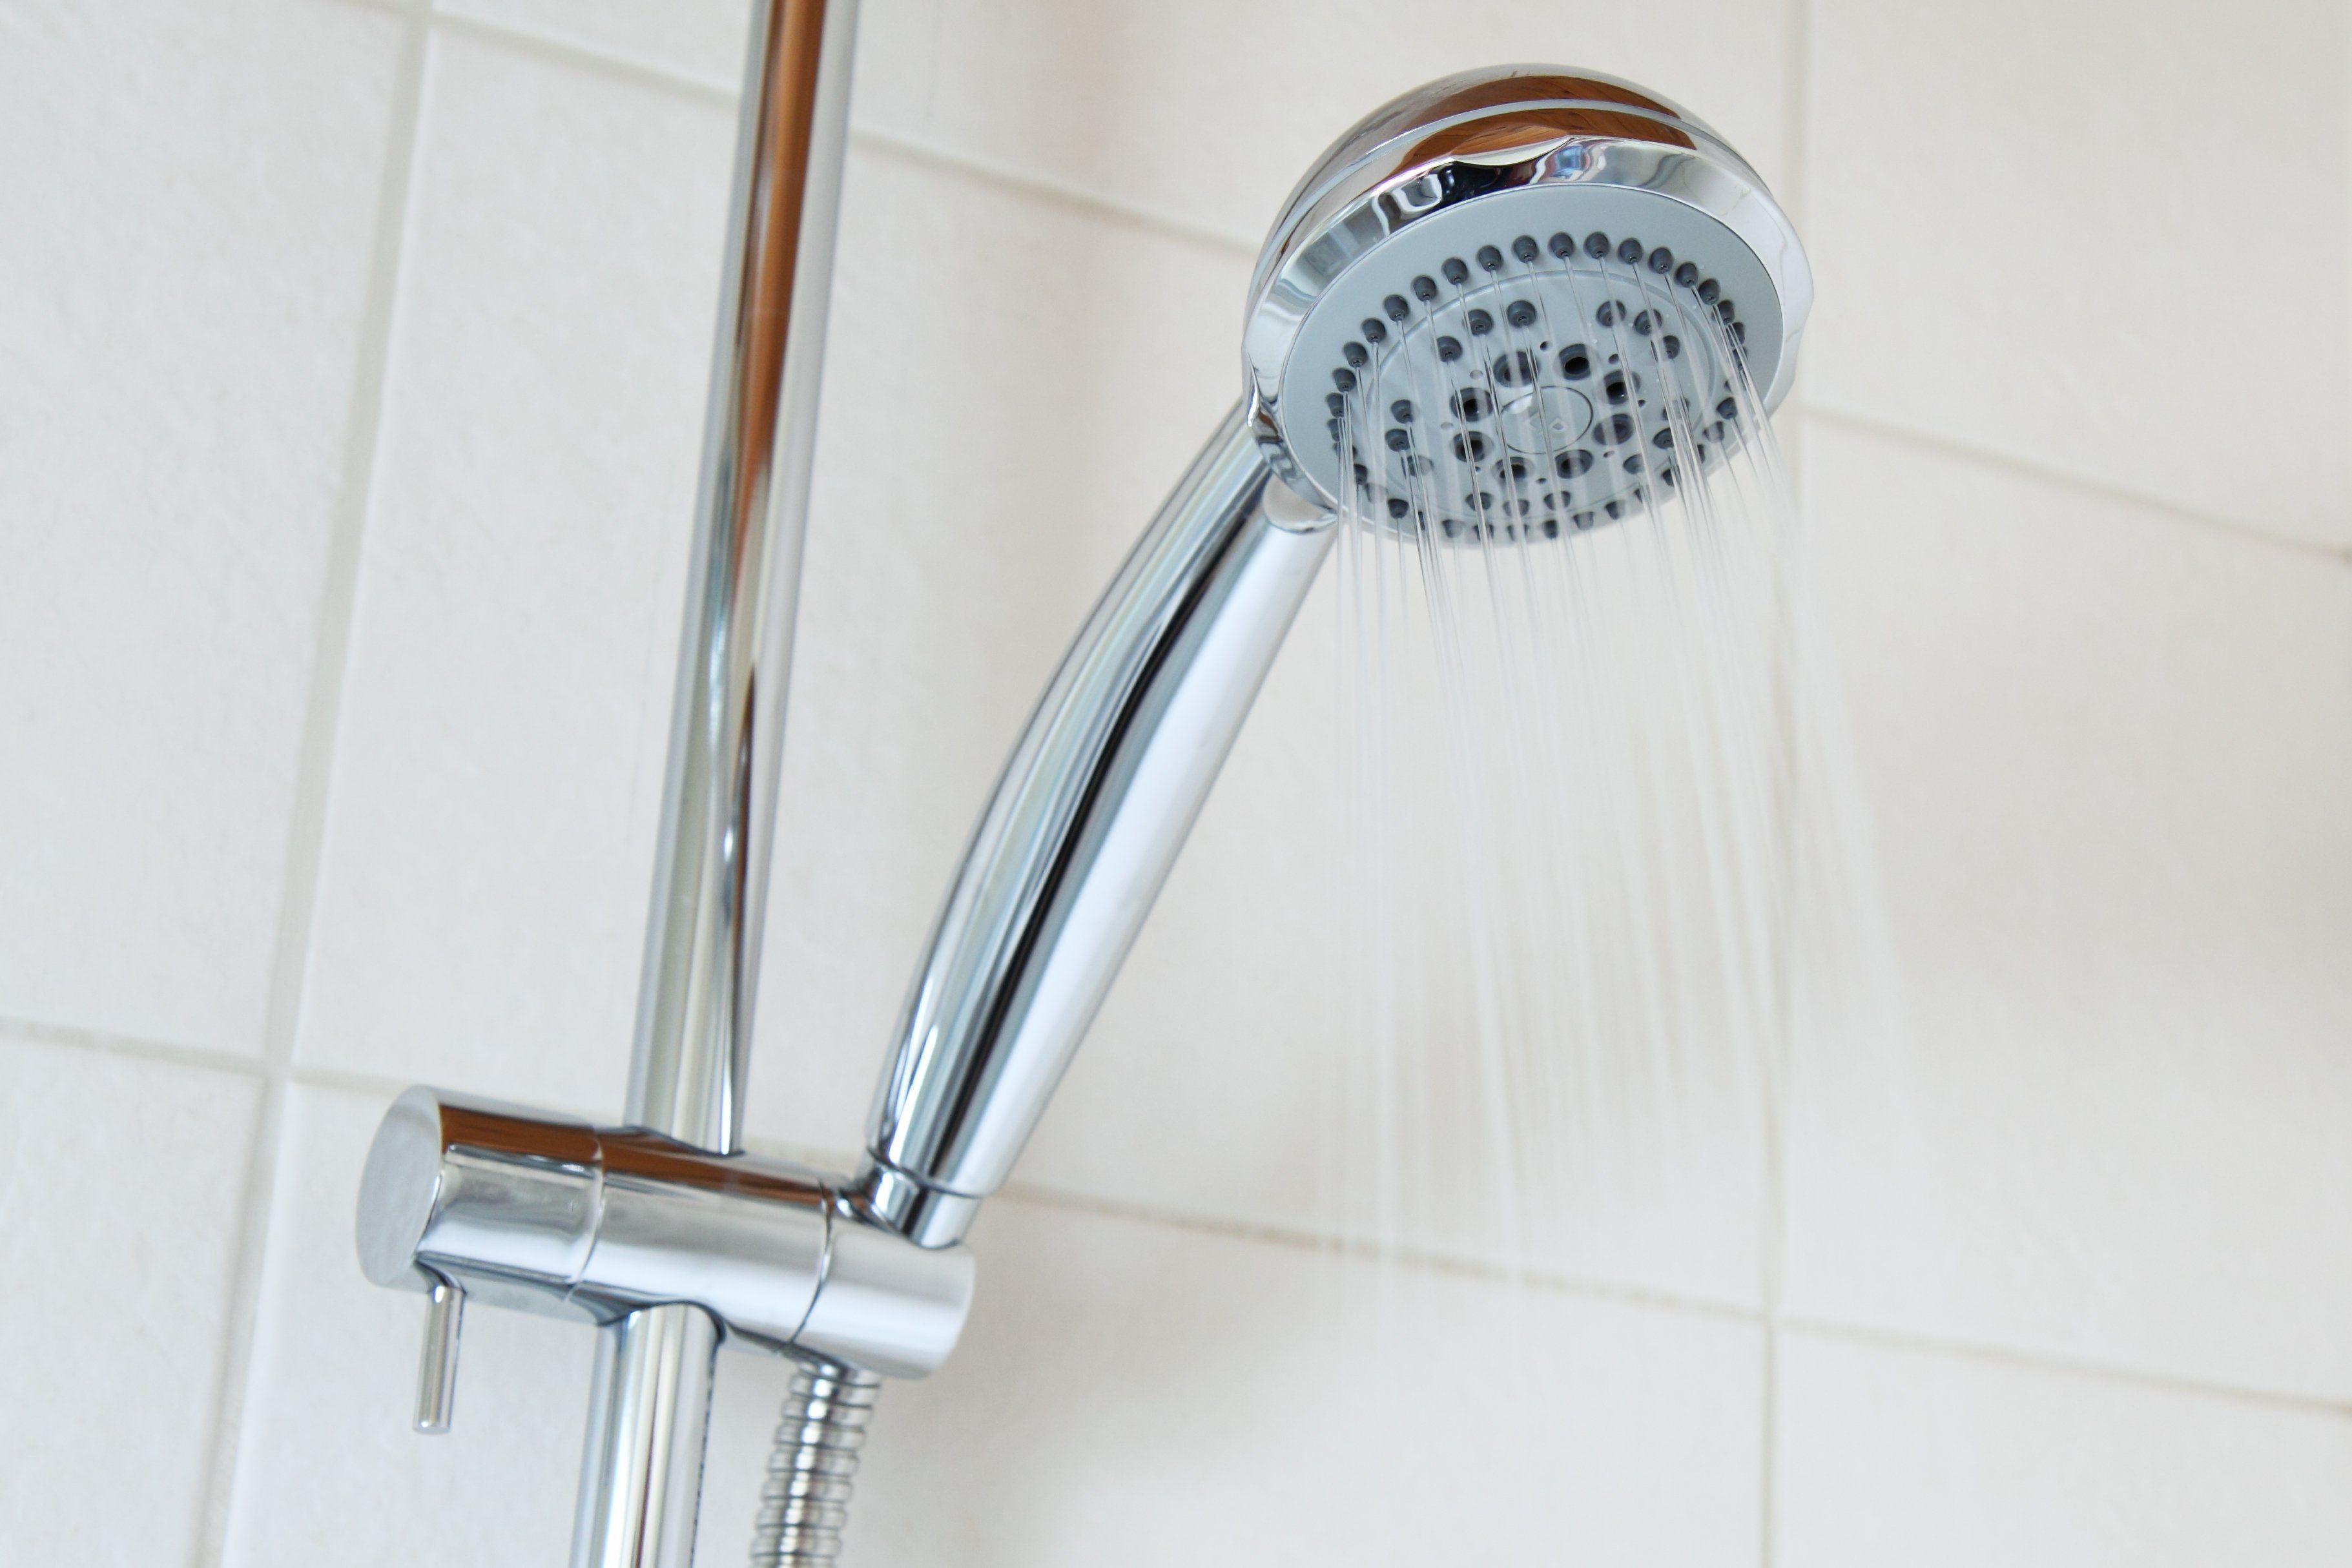 Take A Shower Rather Than A Bath Energyswitcheroo You Need A Lot